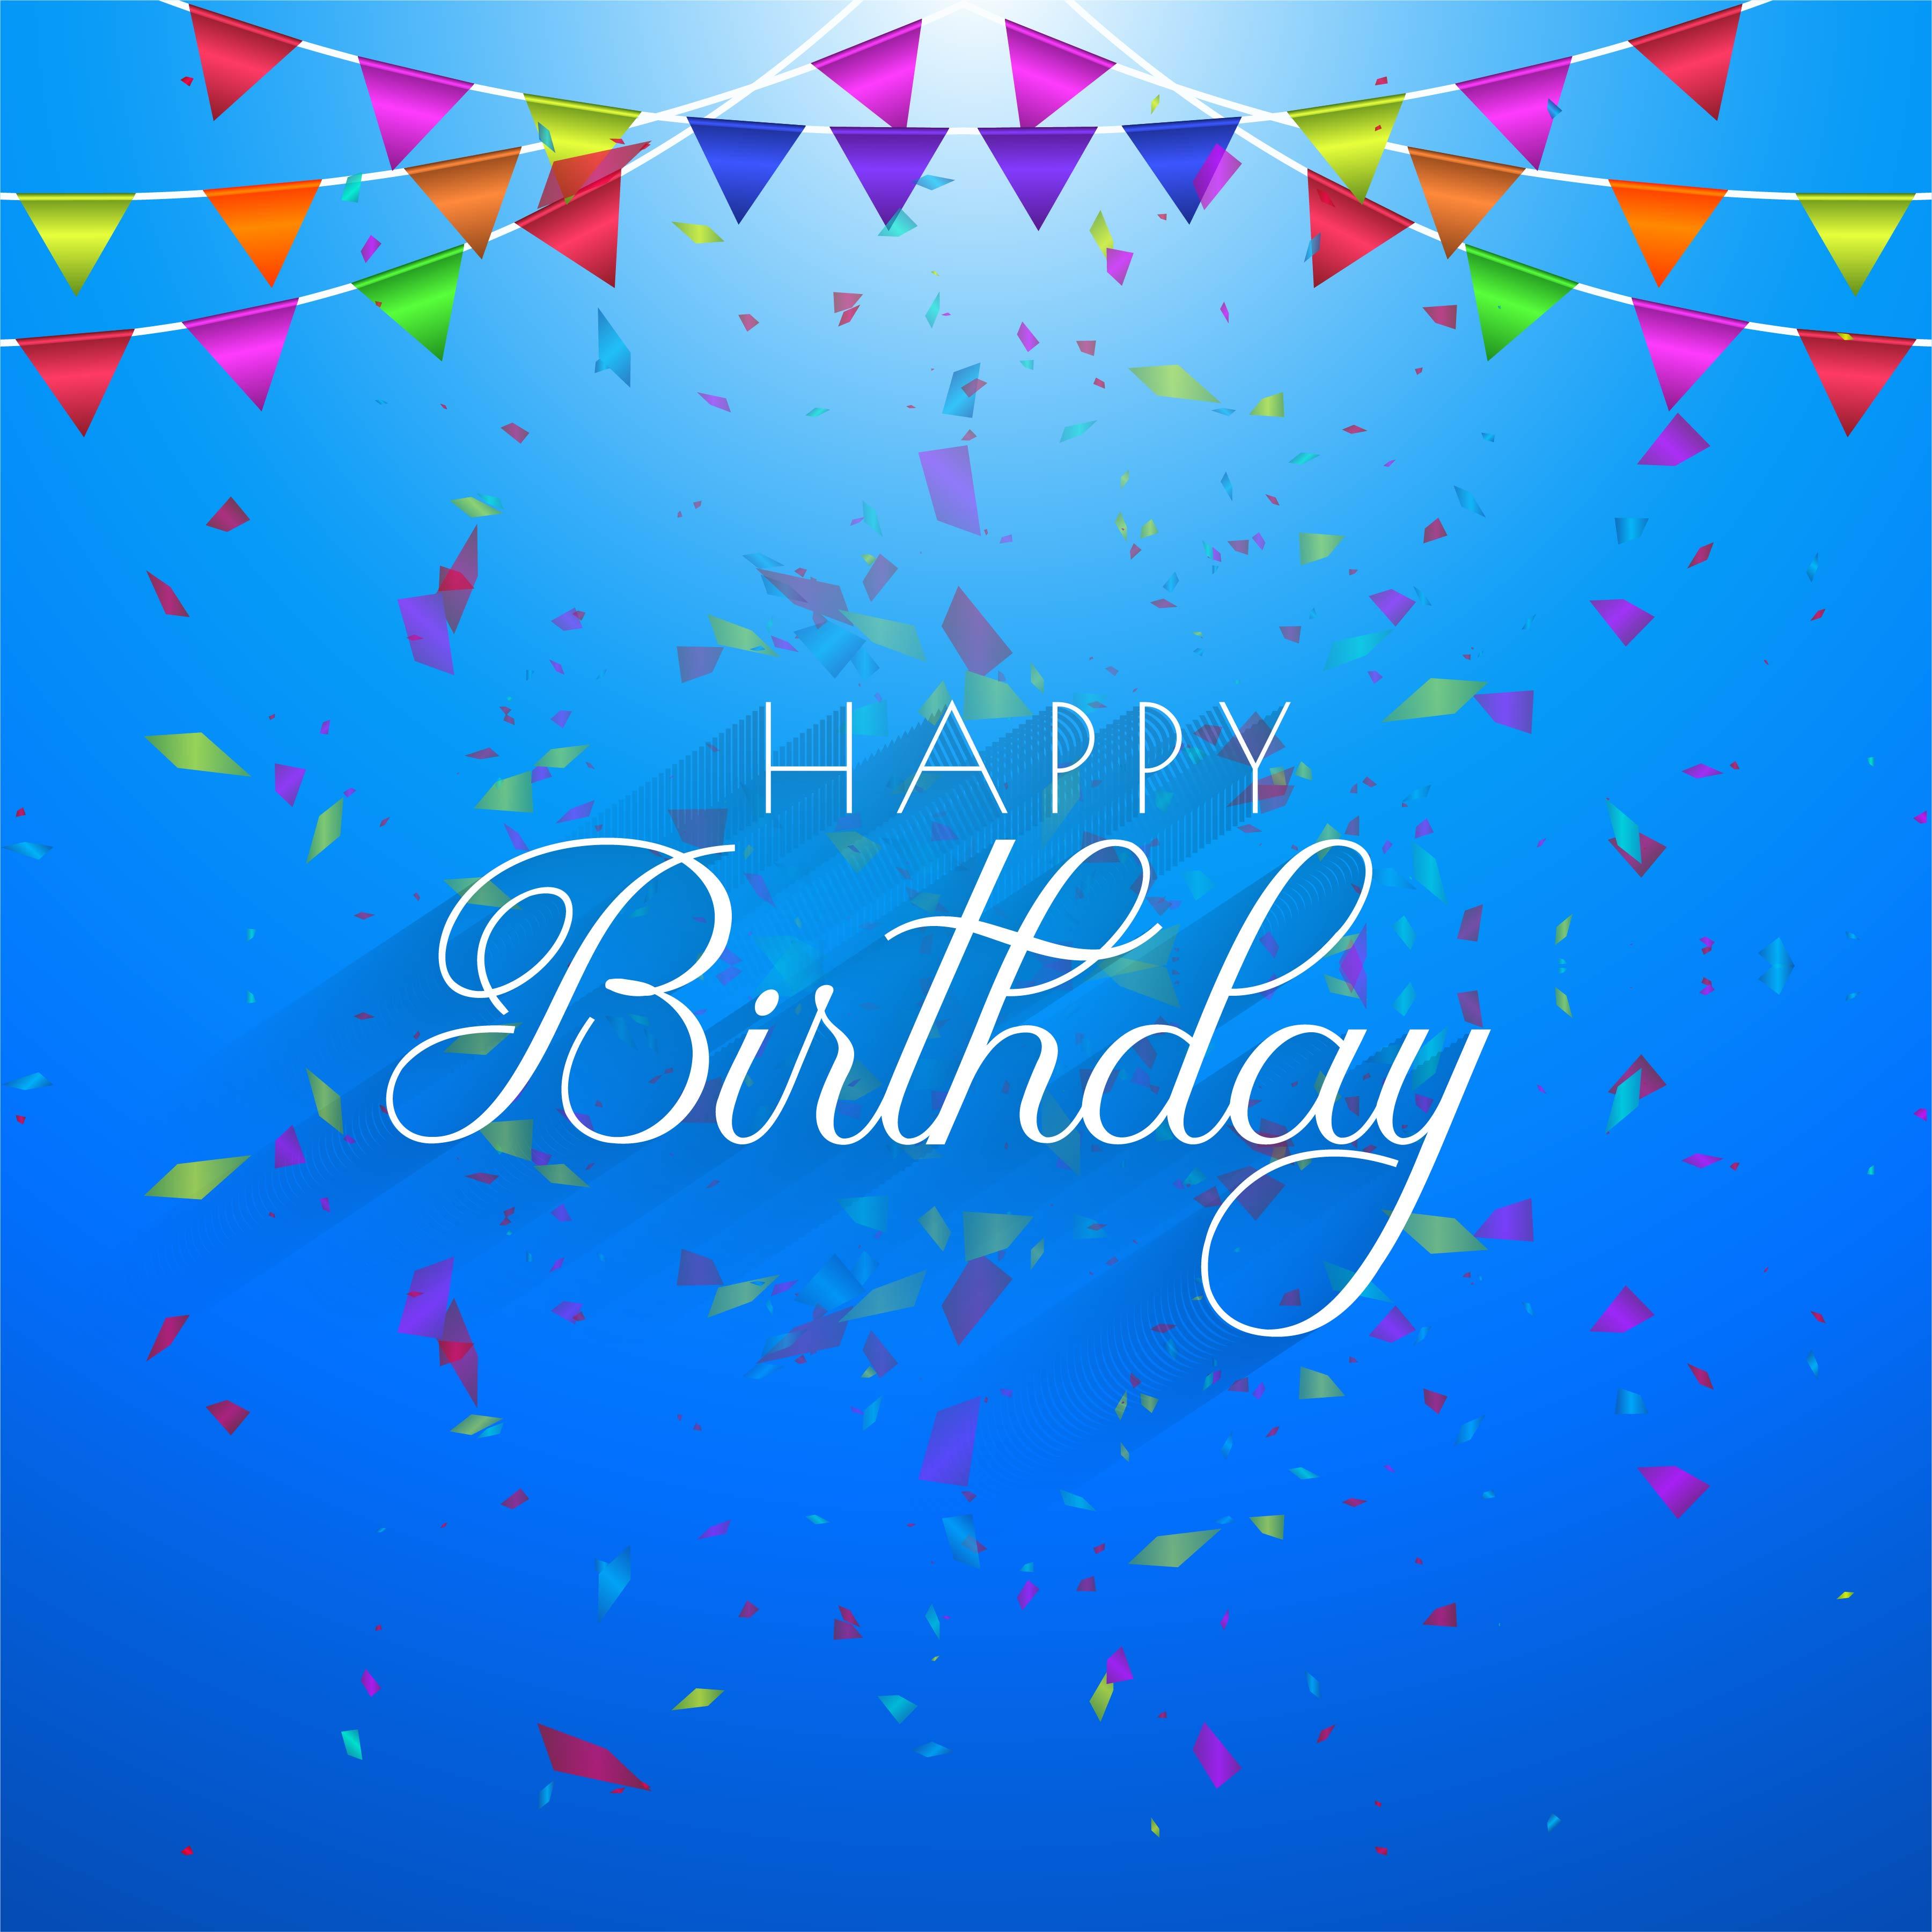 Luxury Party Confetti Colorful Birthday Card Invitation Template Download Free Vectors Clipart Graphics Vector Art